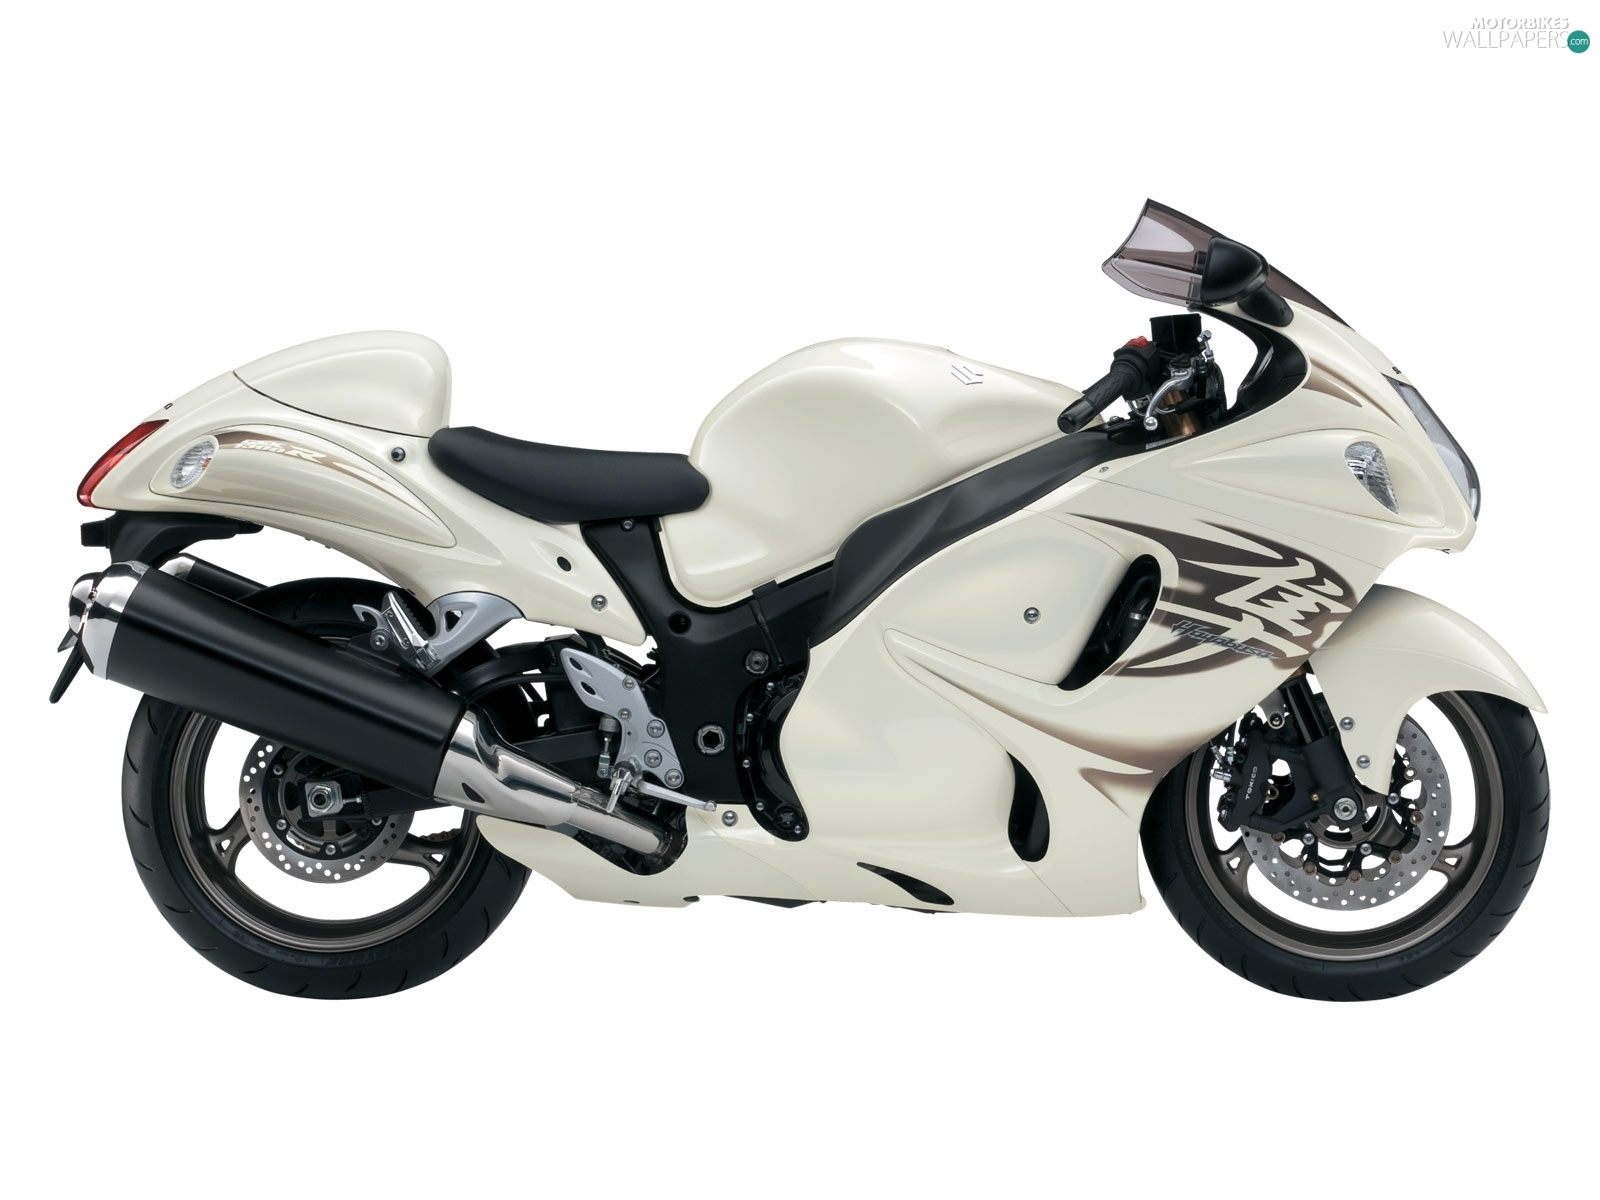 silencer, White, suzuki GSX 1300R Hayabusa - Motorbikes ...  silencer, White...